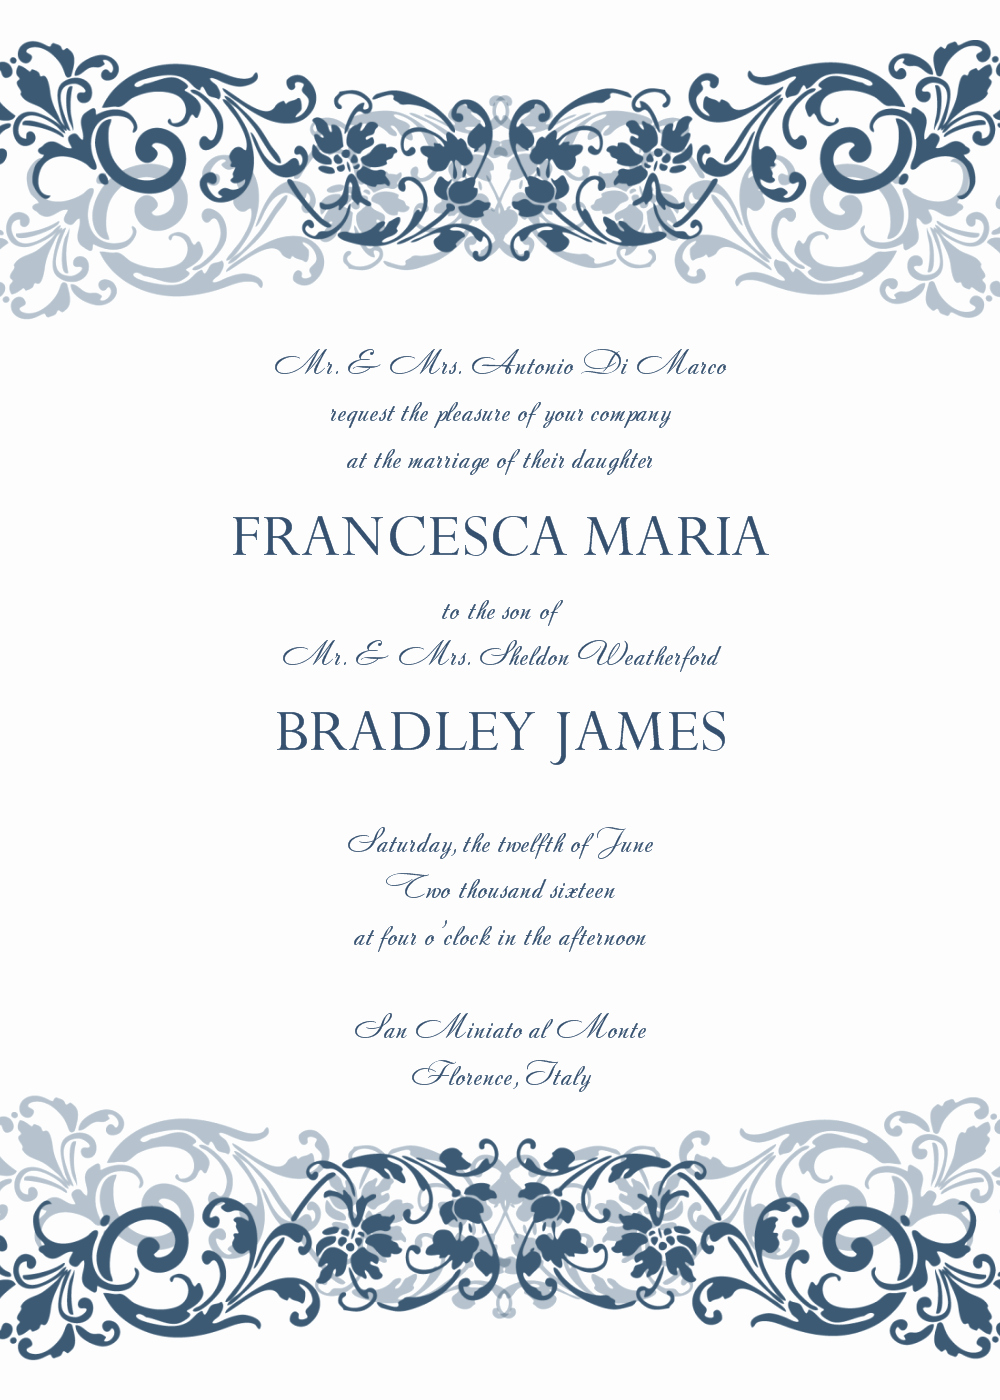 Word Template for Invitations Unique 8 Free Wedding Invitation Templates Excel Pdf formats